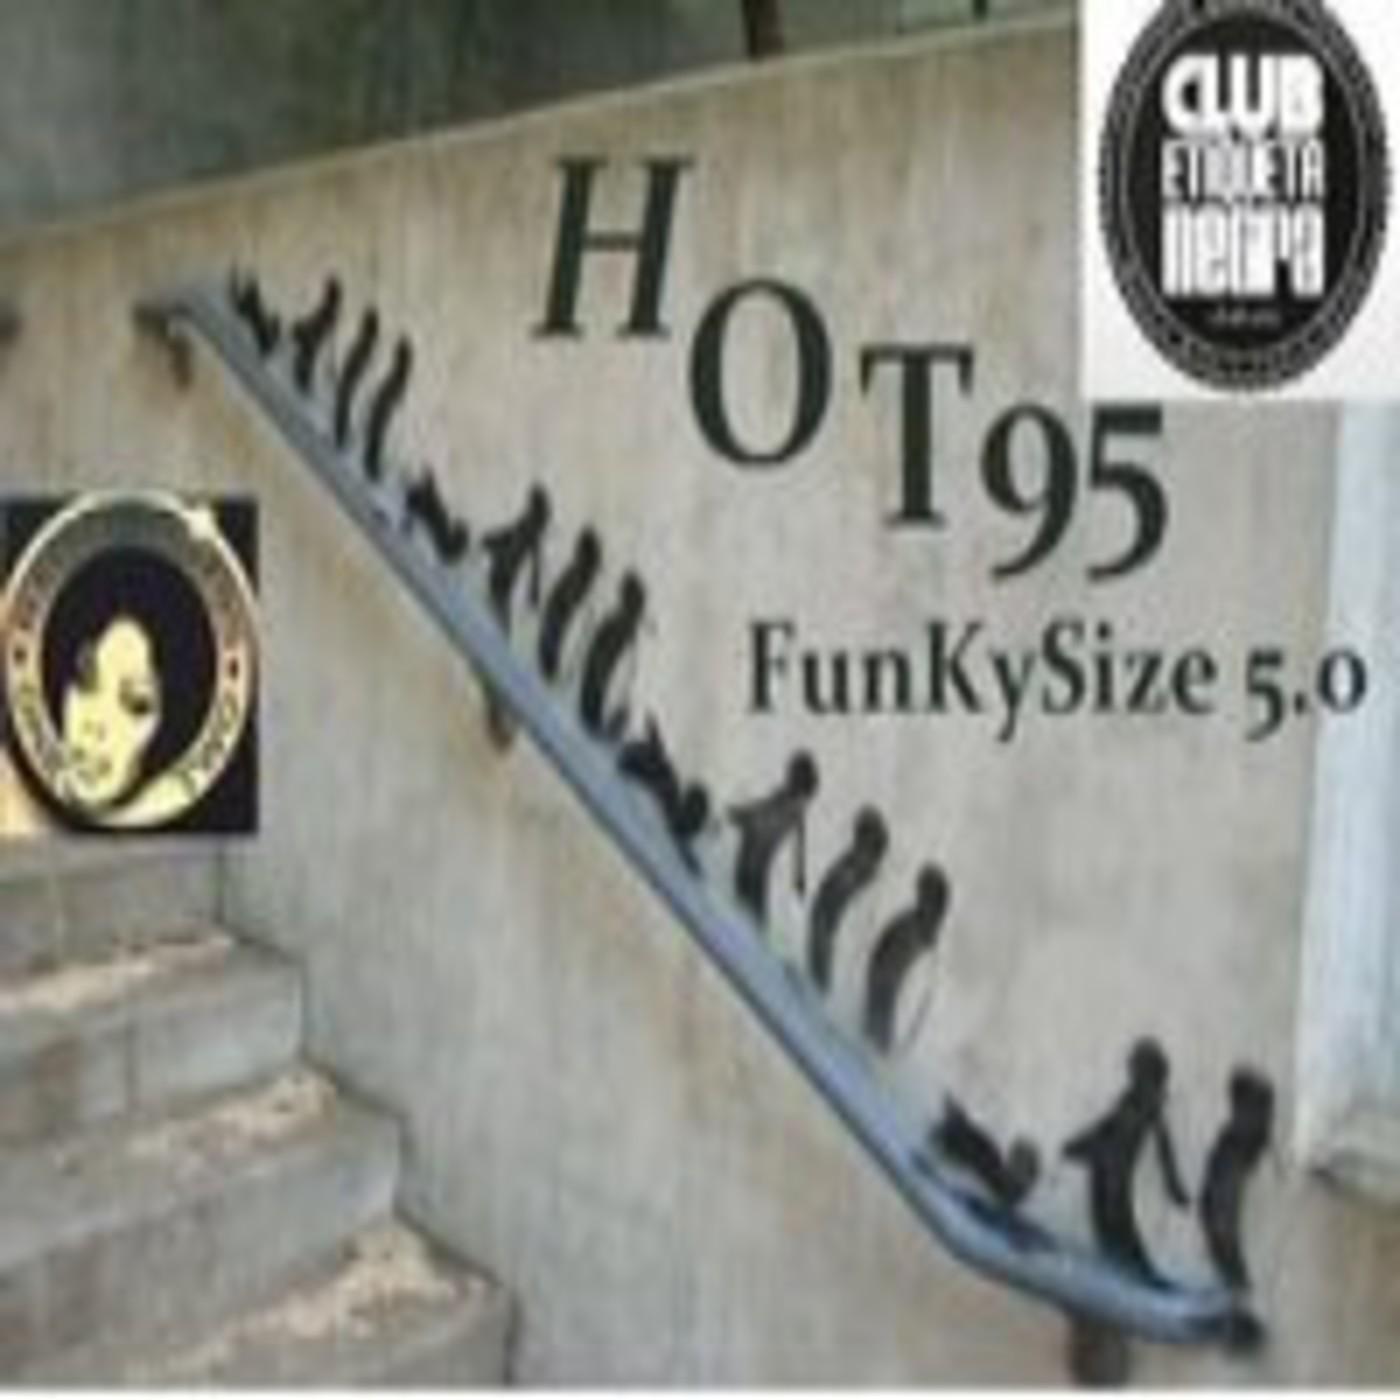 Funkysize 5.0